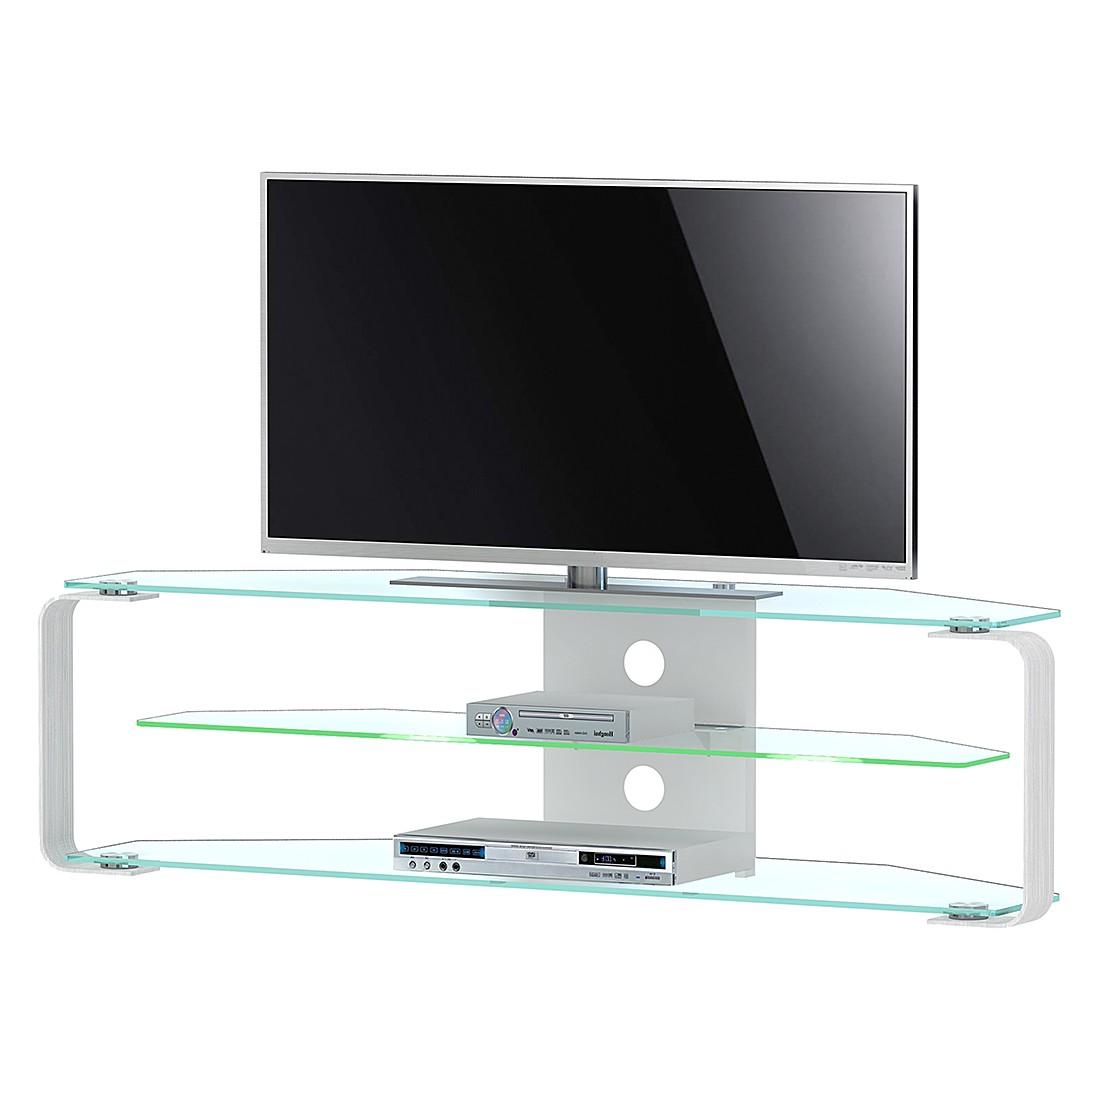 EEK A+, TV-Rack CU-MR (inkl. Beleuchtung) - Aluminium/Glas - 140 cm, Jahnke